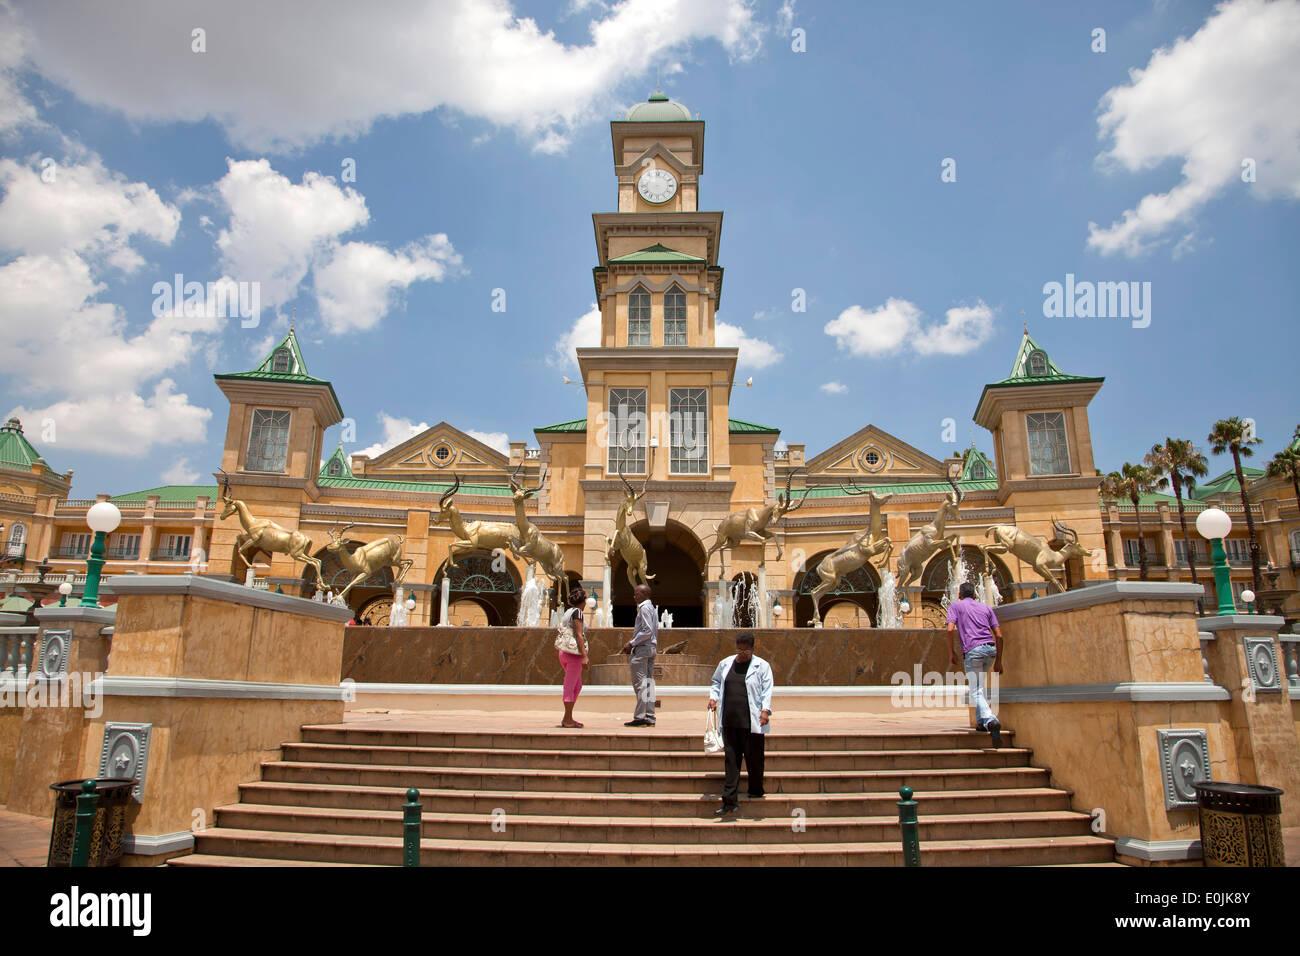 Gold Reef City Casino e Hotel a Johannesburg Gauteng, Sud Africa e Africa Immagini Stock